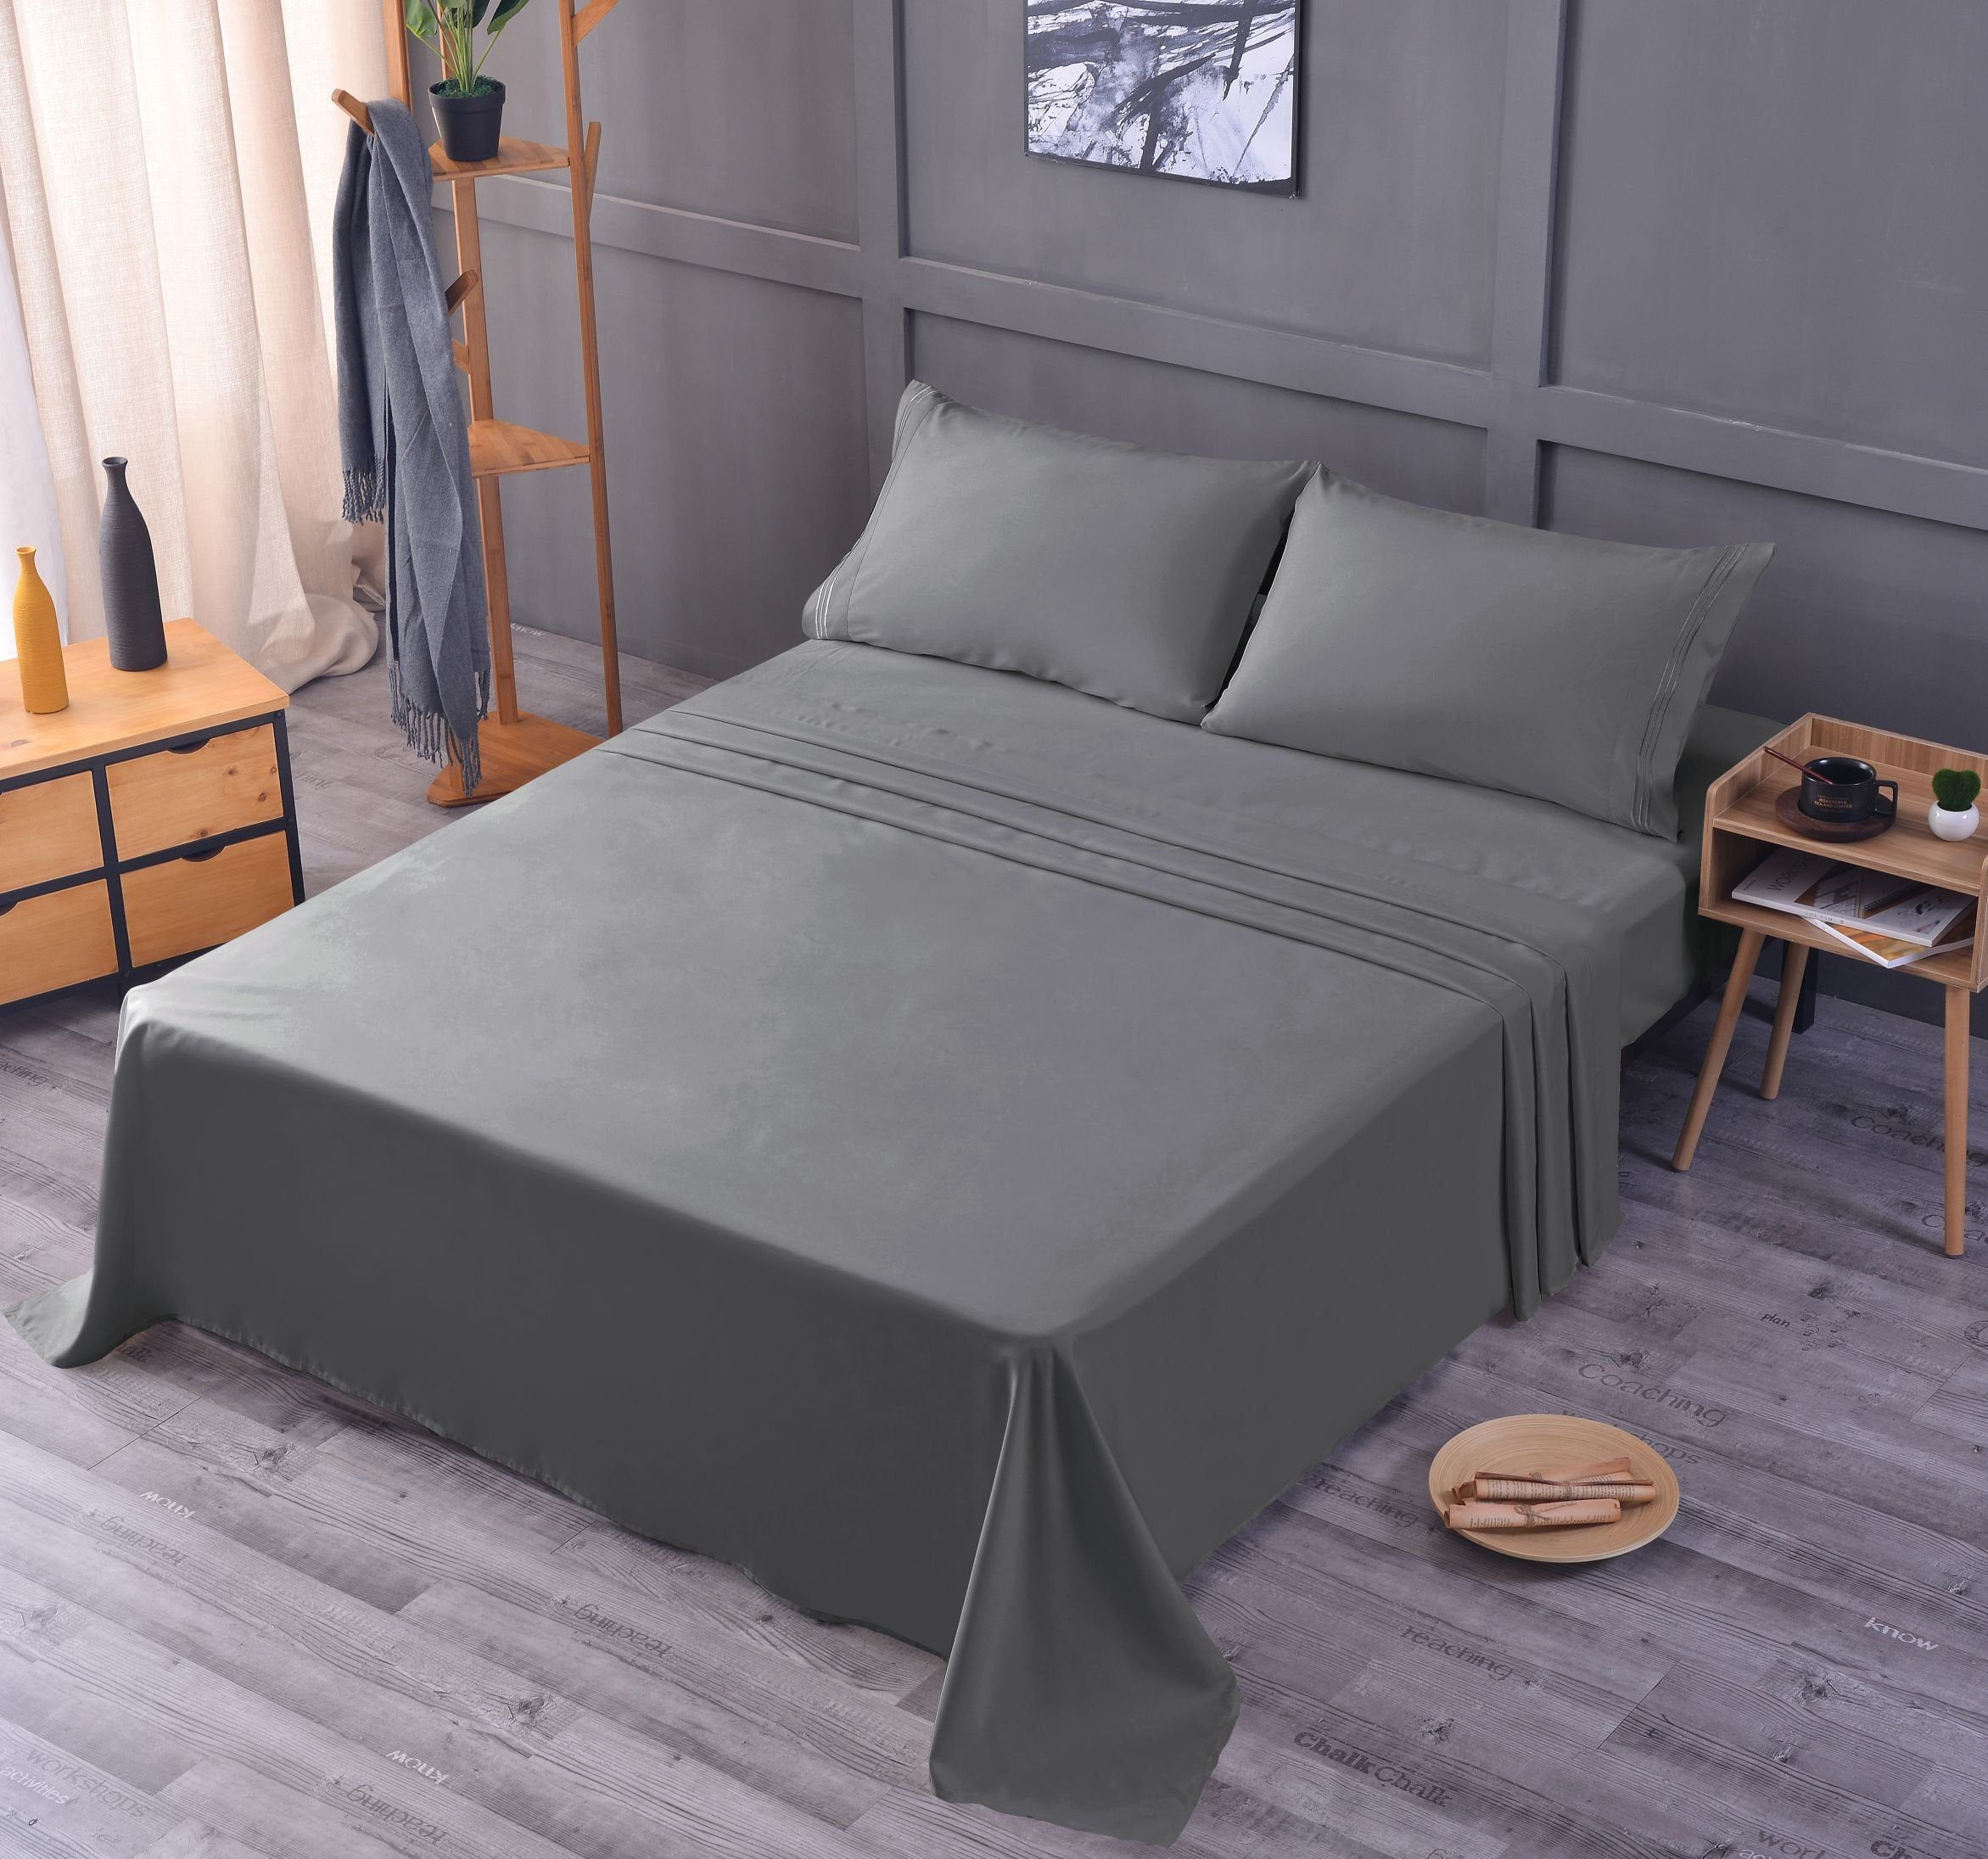 Bedsheet Panosundaki Pin